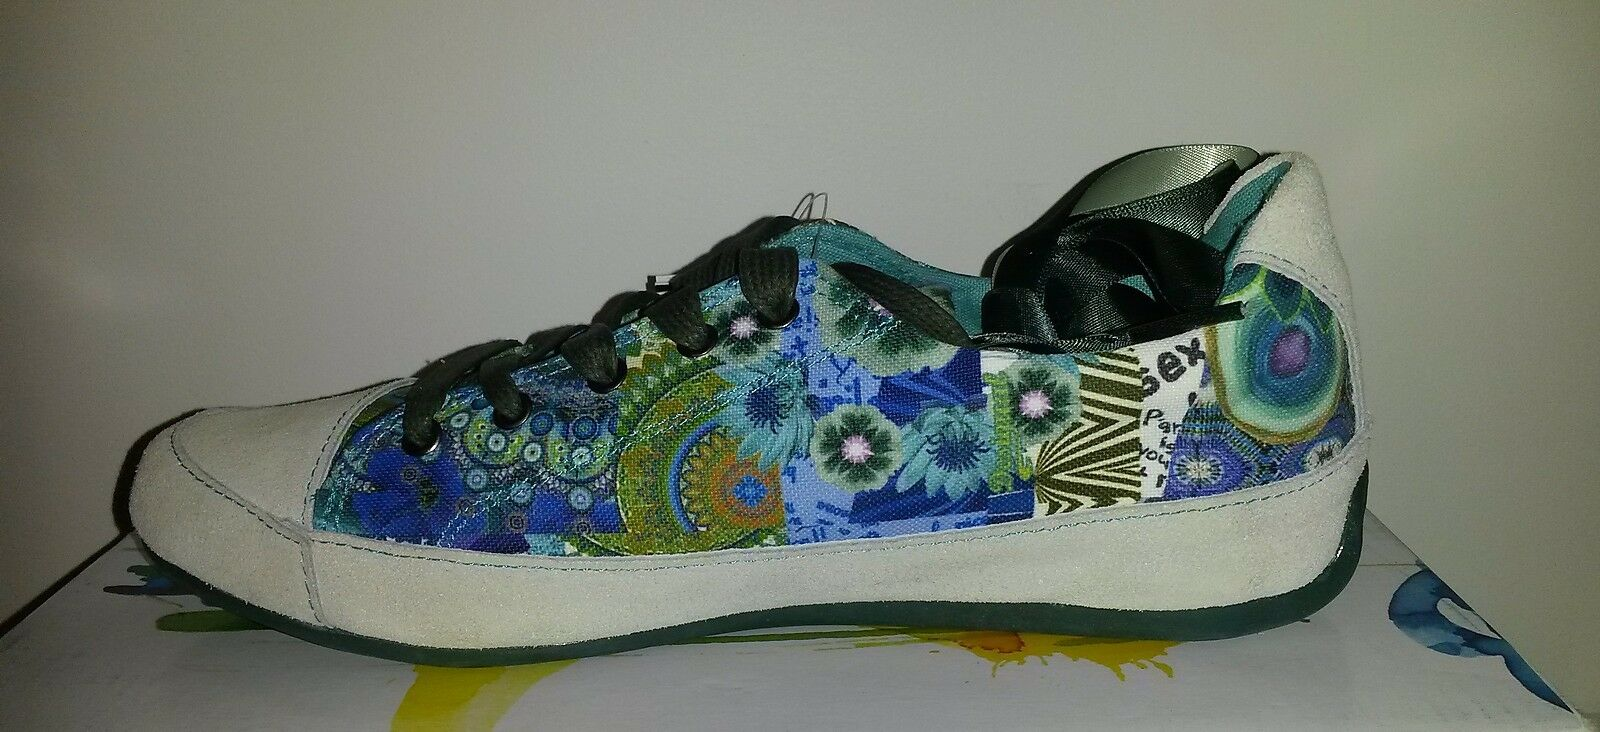 DESIGUAL 51KS1C2/5024 LOLA - Sneaker Baskets Basses mode Turquoise Psyché NEUF